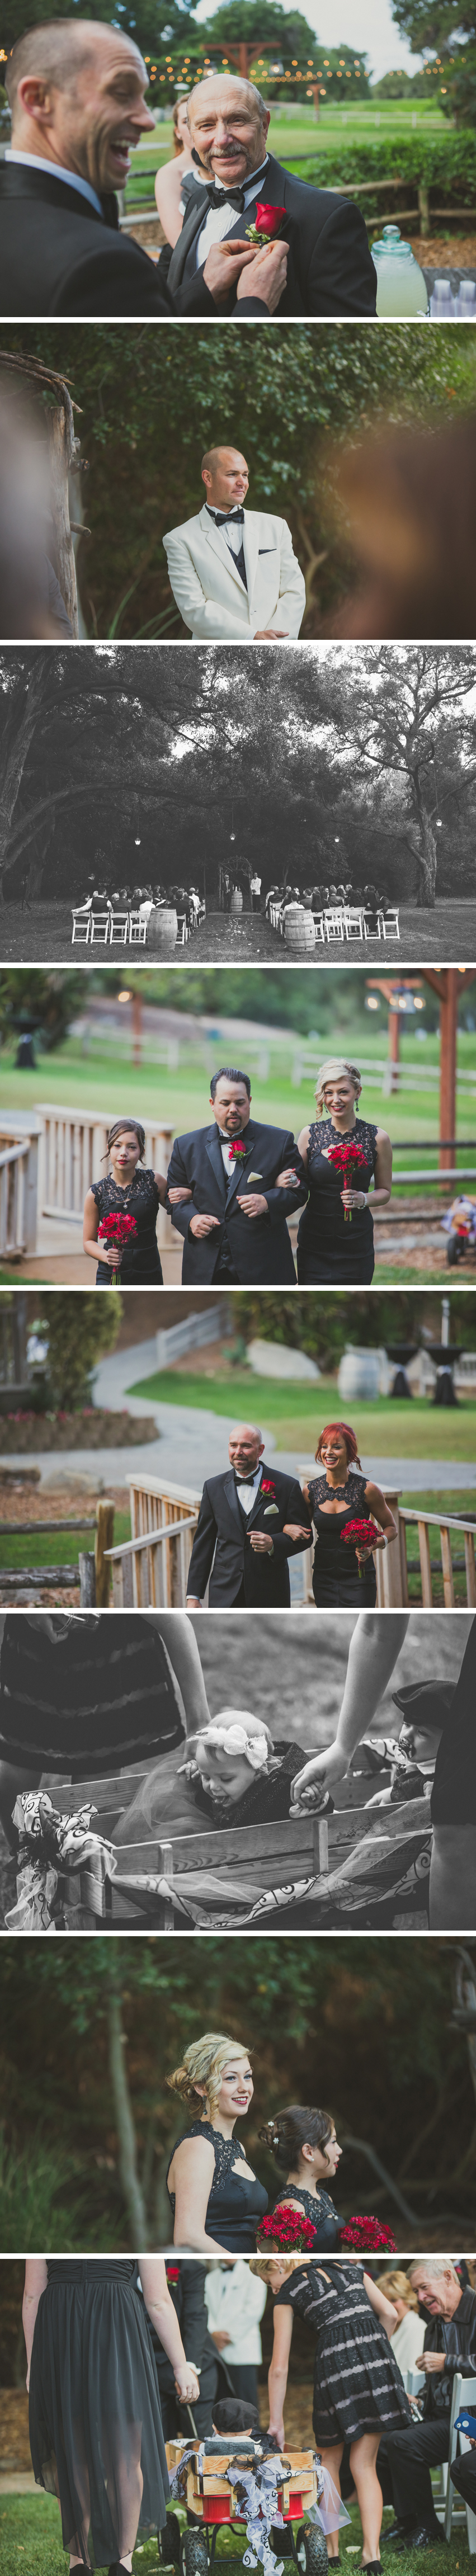 TCI-wedding7